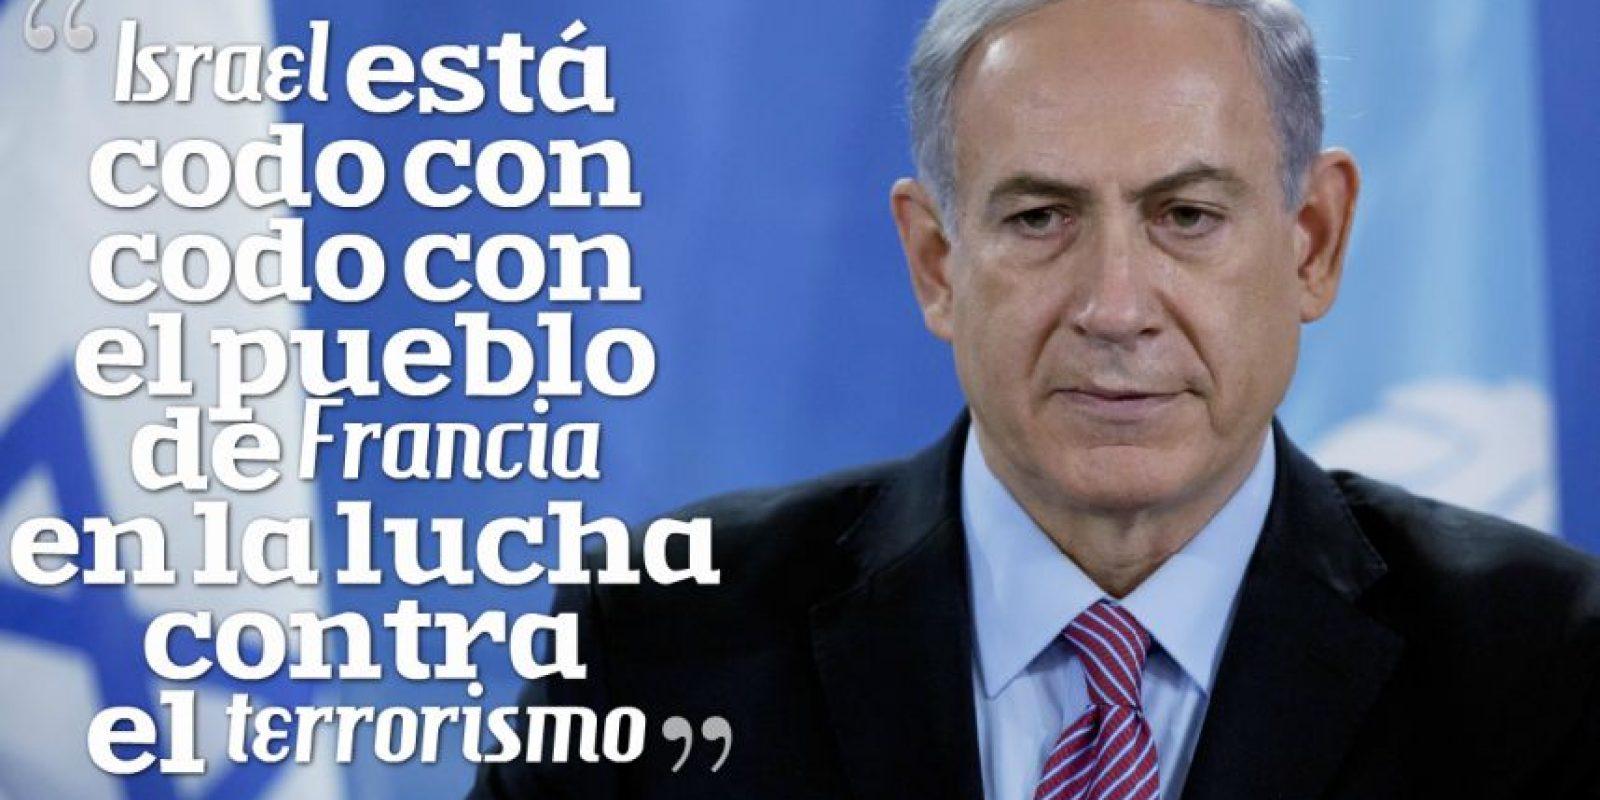 BENJAMÍN NETANYAHU, Primer Ministro de Israel. Foto:Getty Images